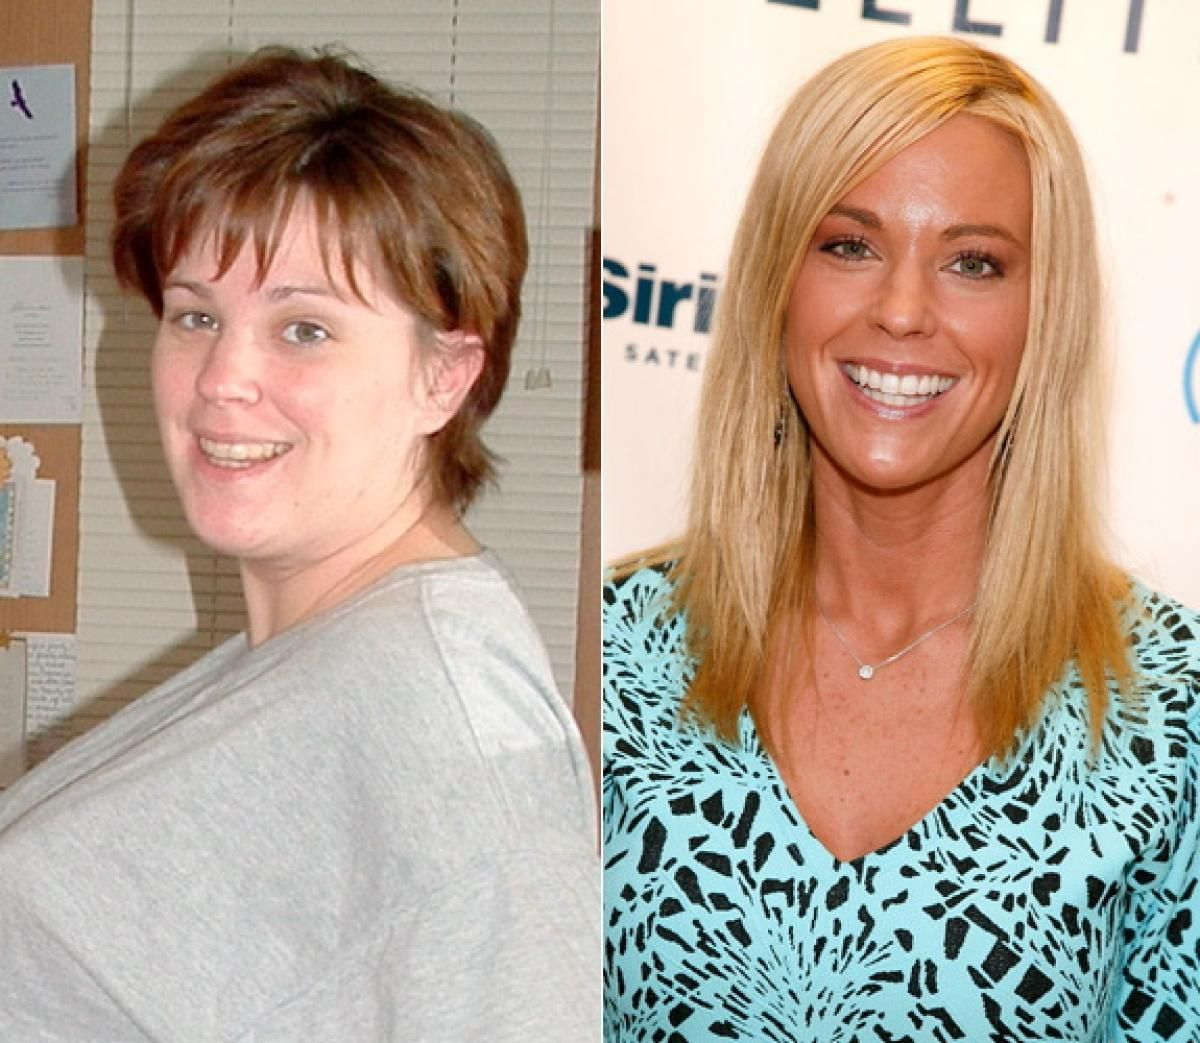 Kate gosselin photos celebs who had plastic surgery